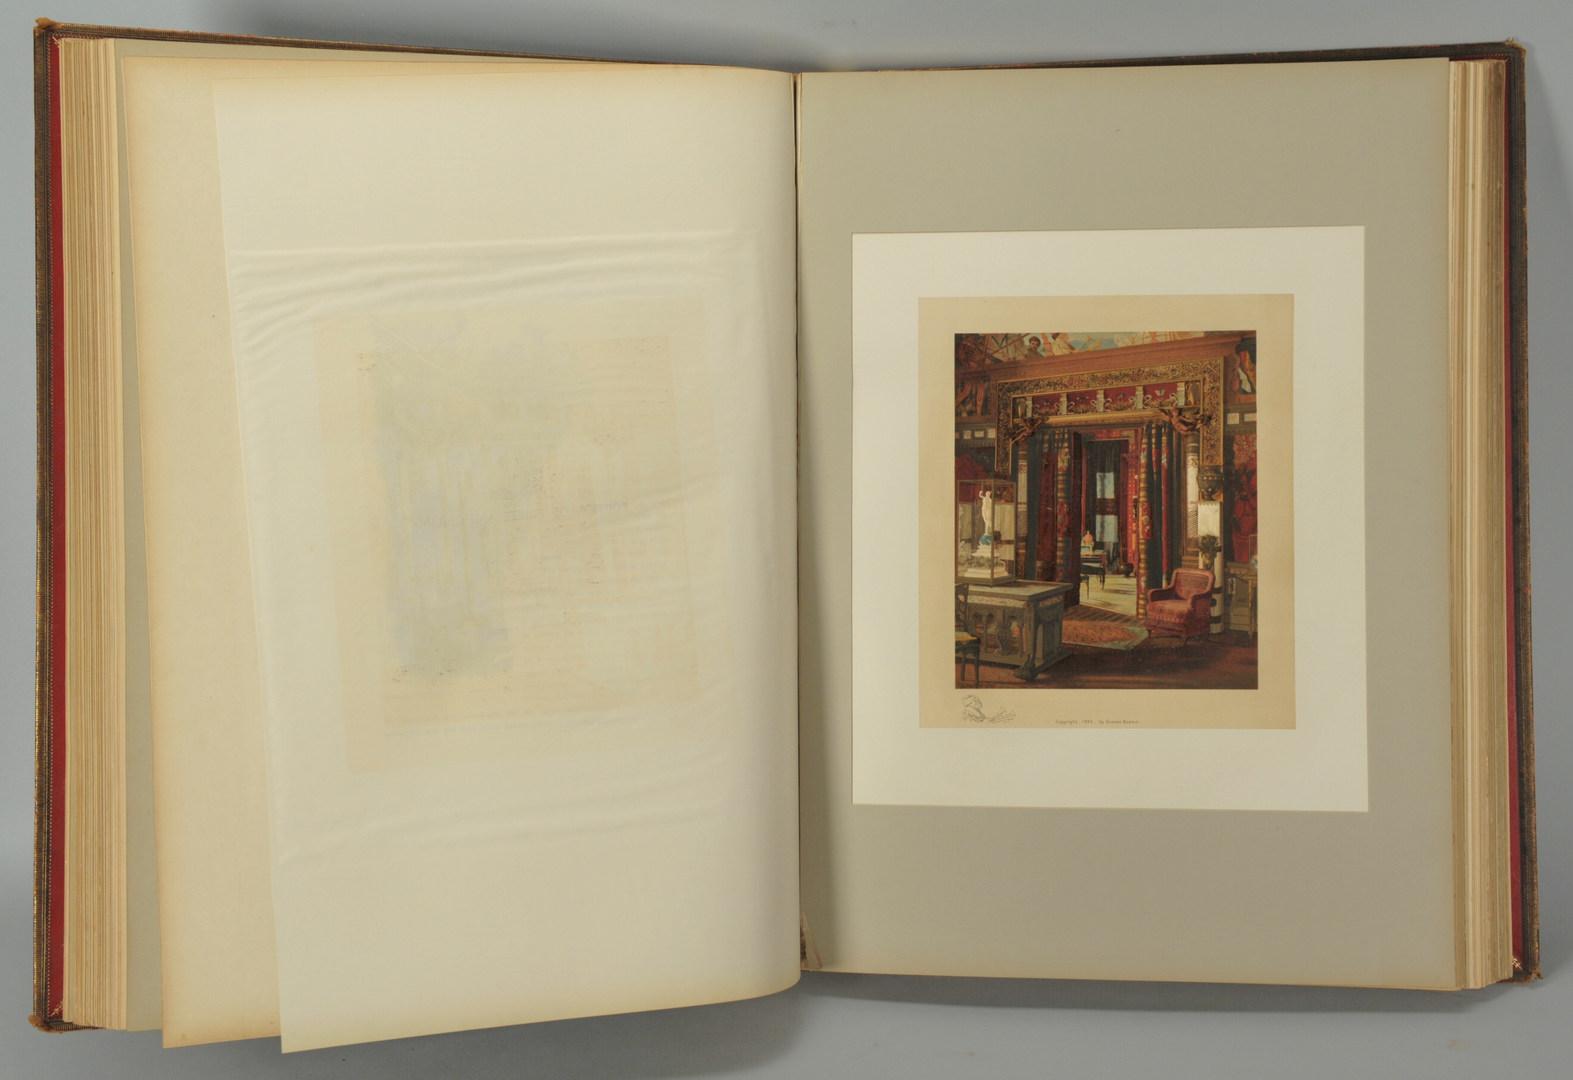 Lot 554: 4 vol. set, Mr. Vanderbilt's House and Collection